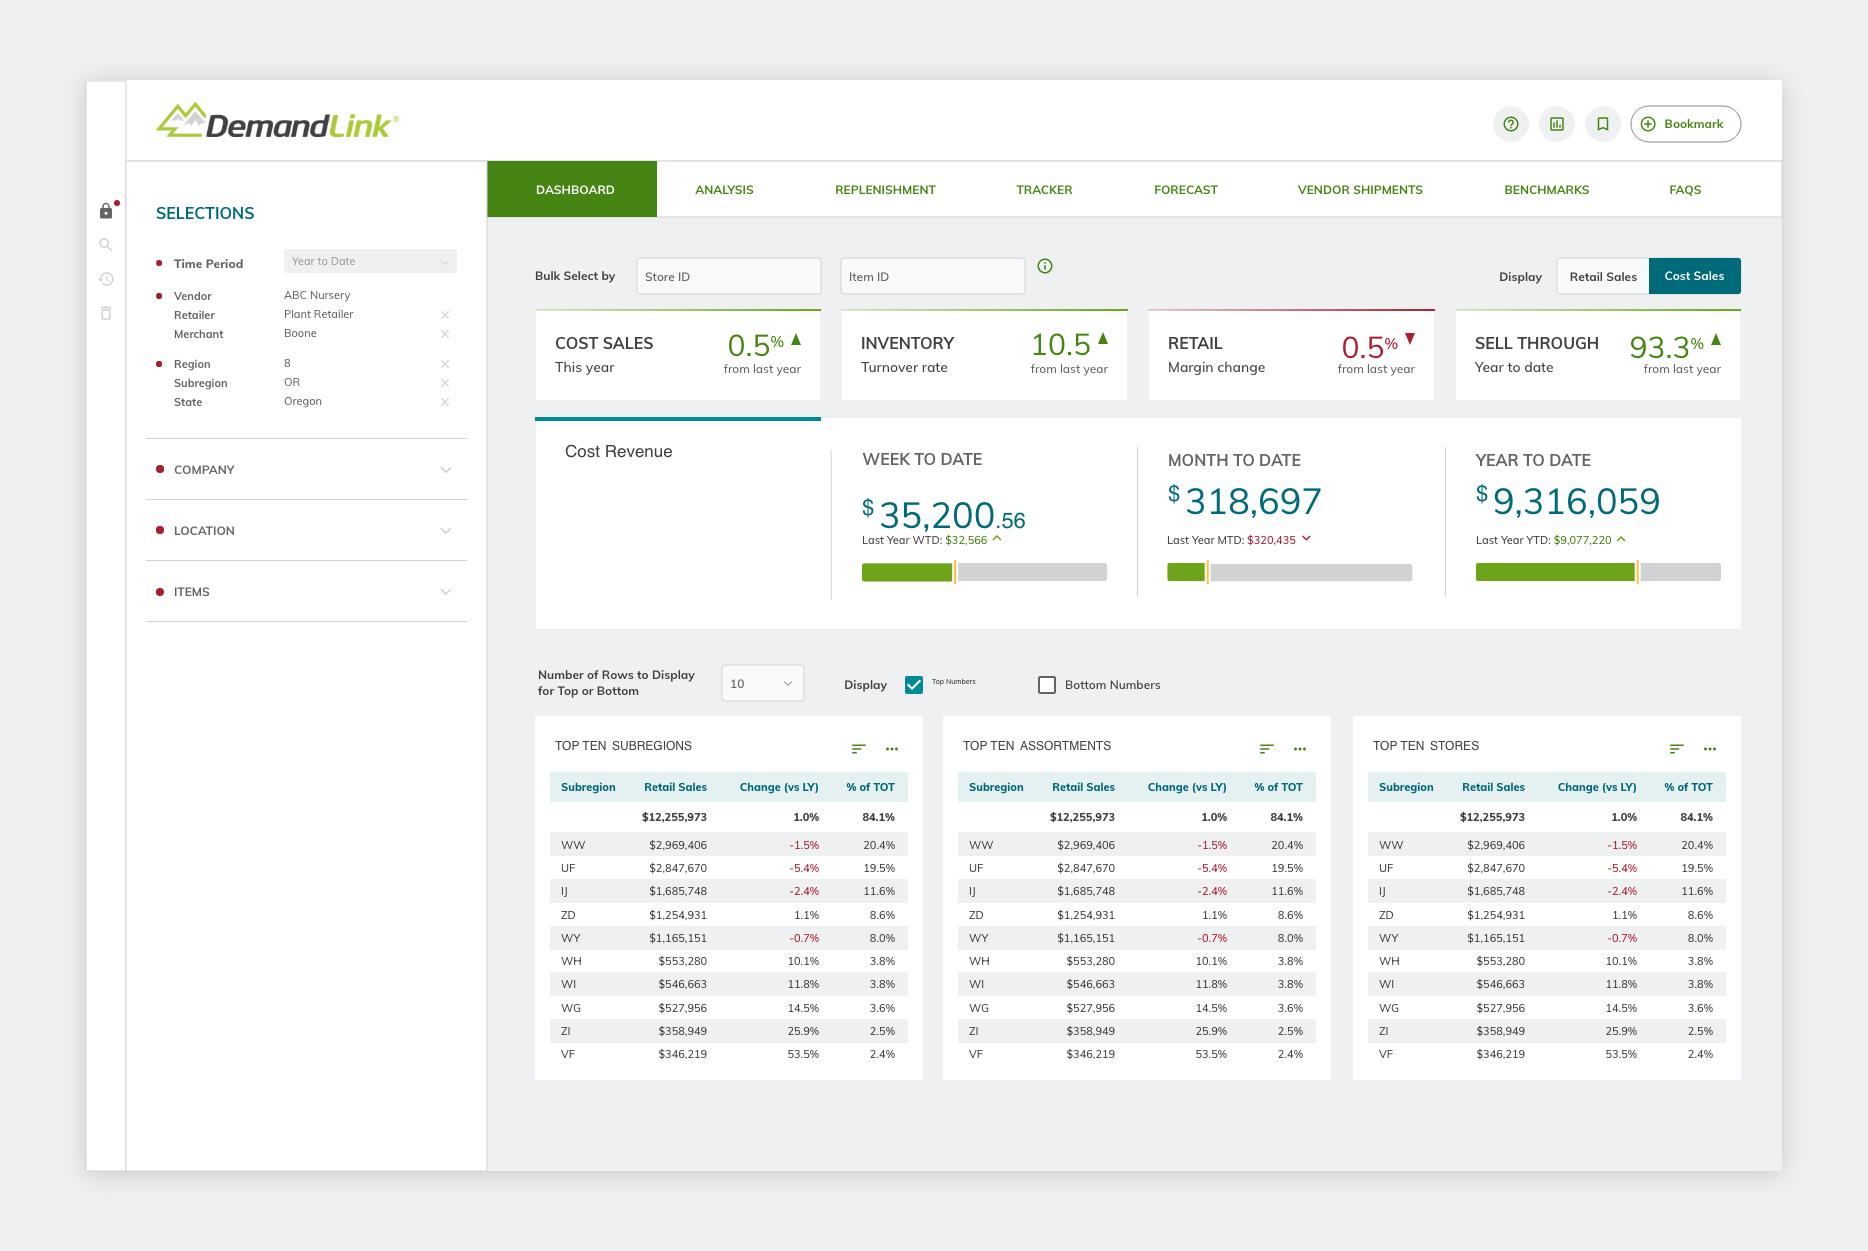 DemandLink - Website Design System Dashboard Page